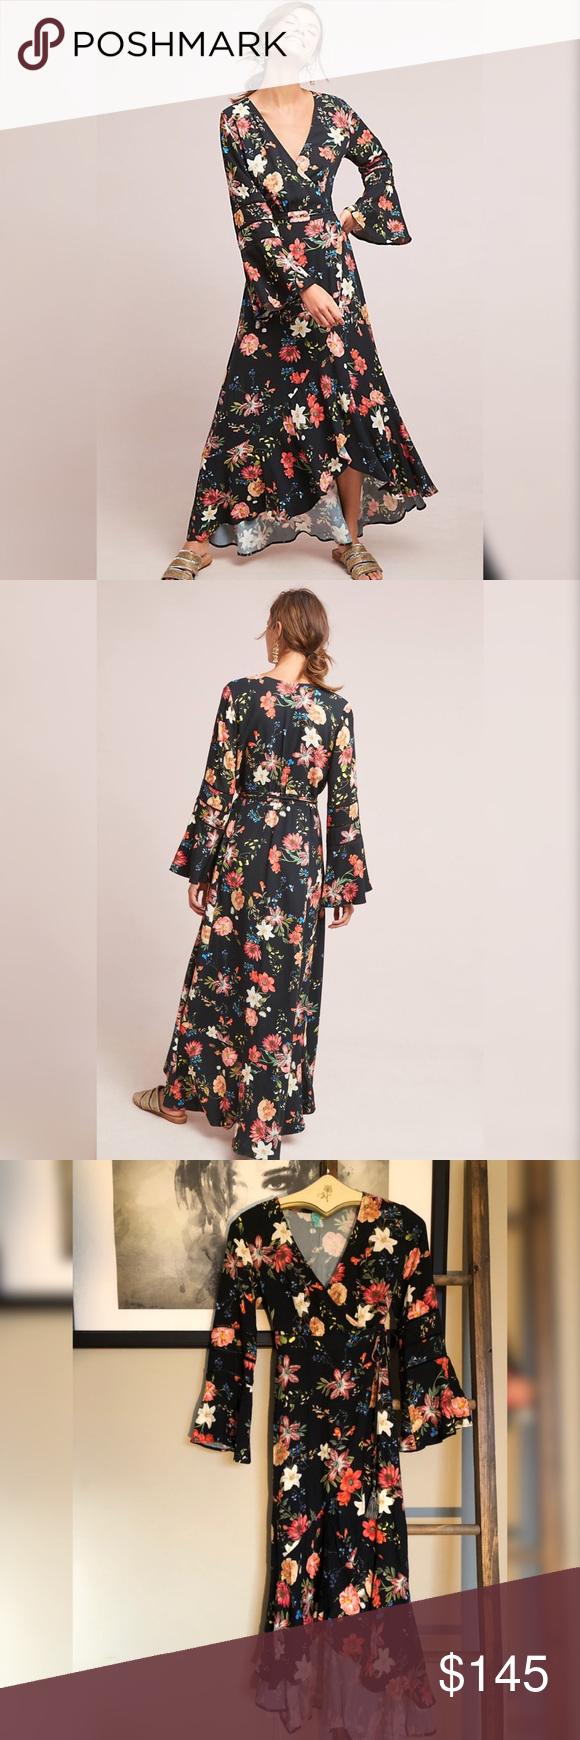 958bb628d233c Anthropologie Farm Rio Summer Flower Wrap Dress What began as a handful of  goods at a